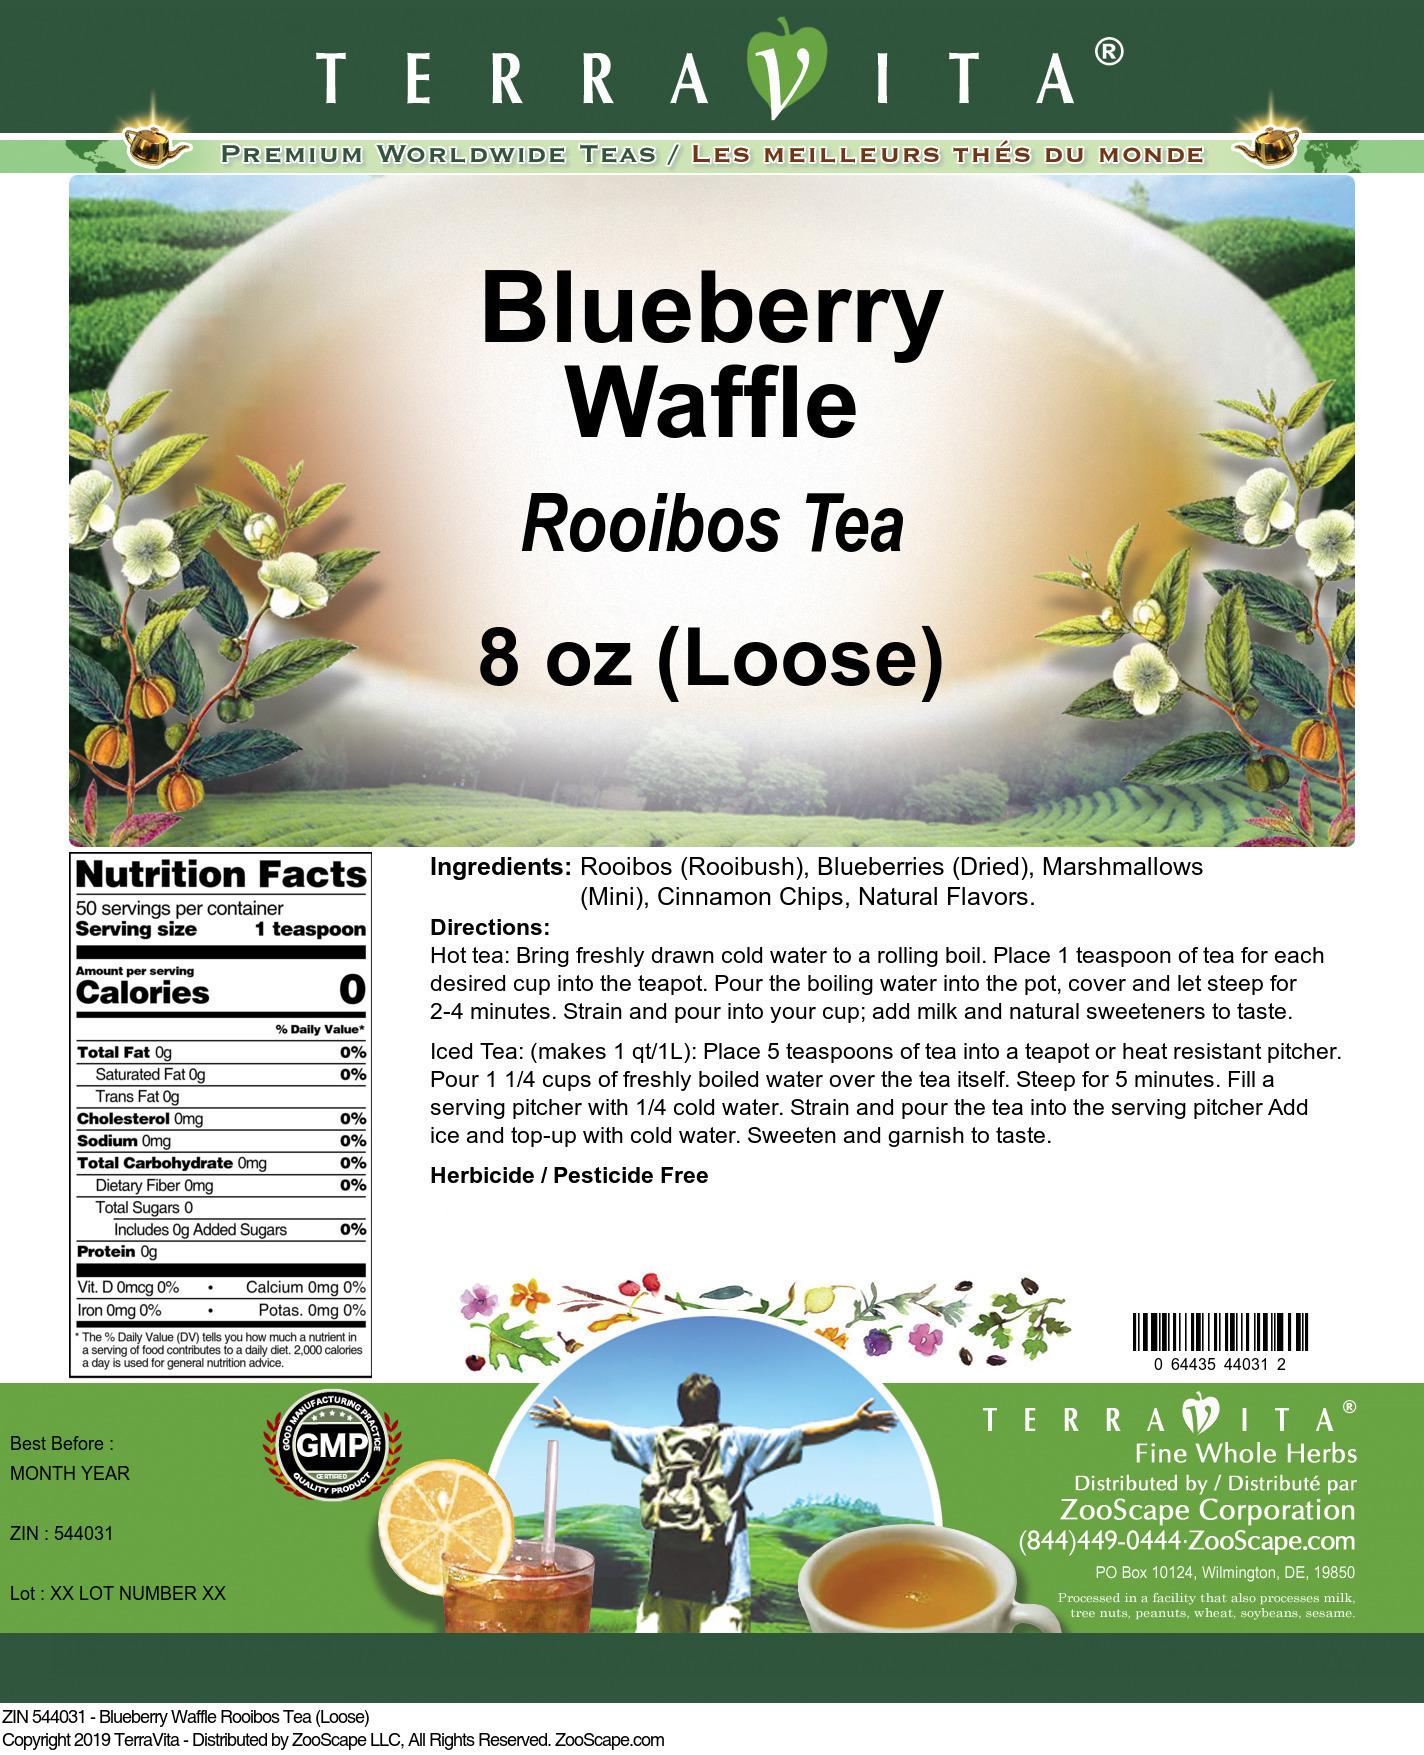 Blueberry Waffle Rooibos Tea